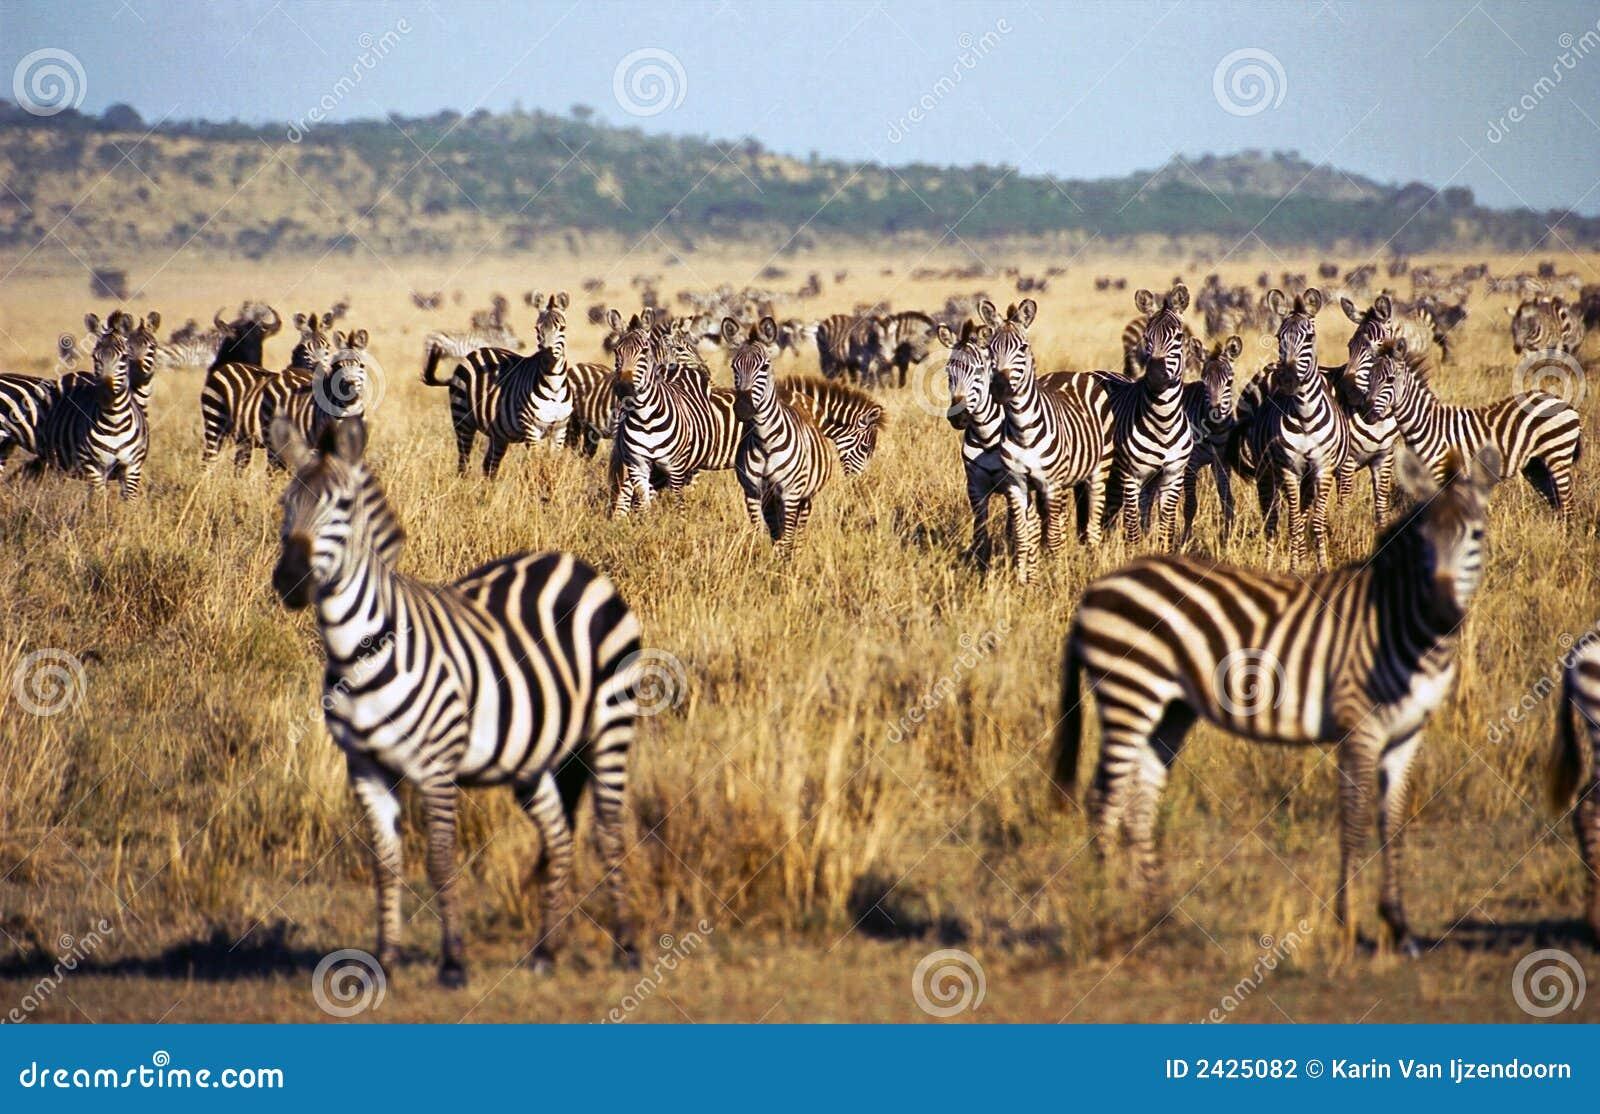 Zebra Herd During Serengeti Migration Stock Photography